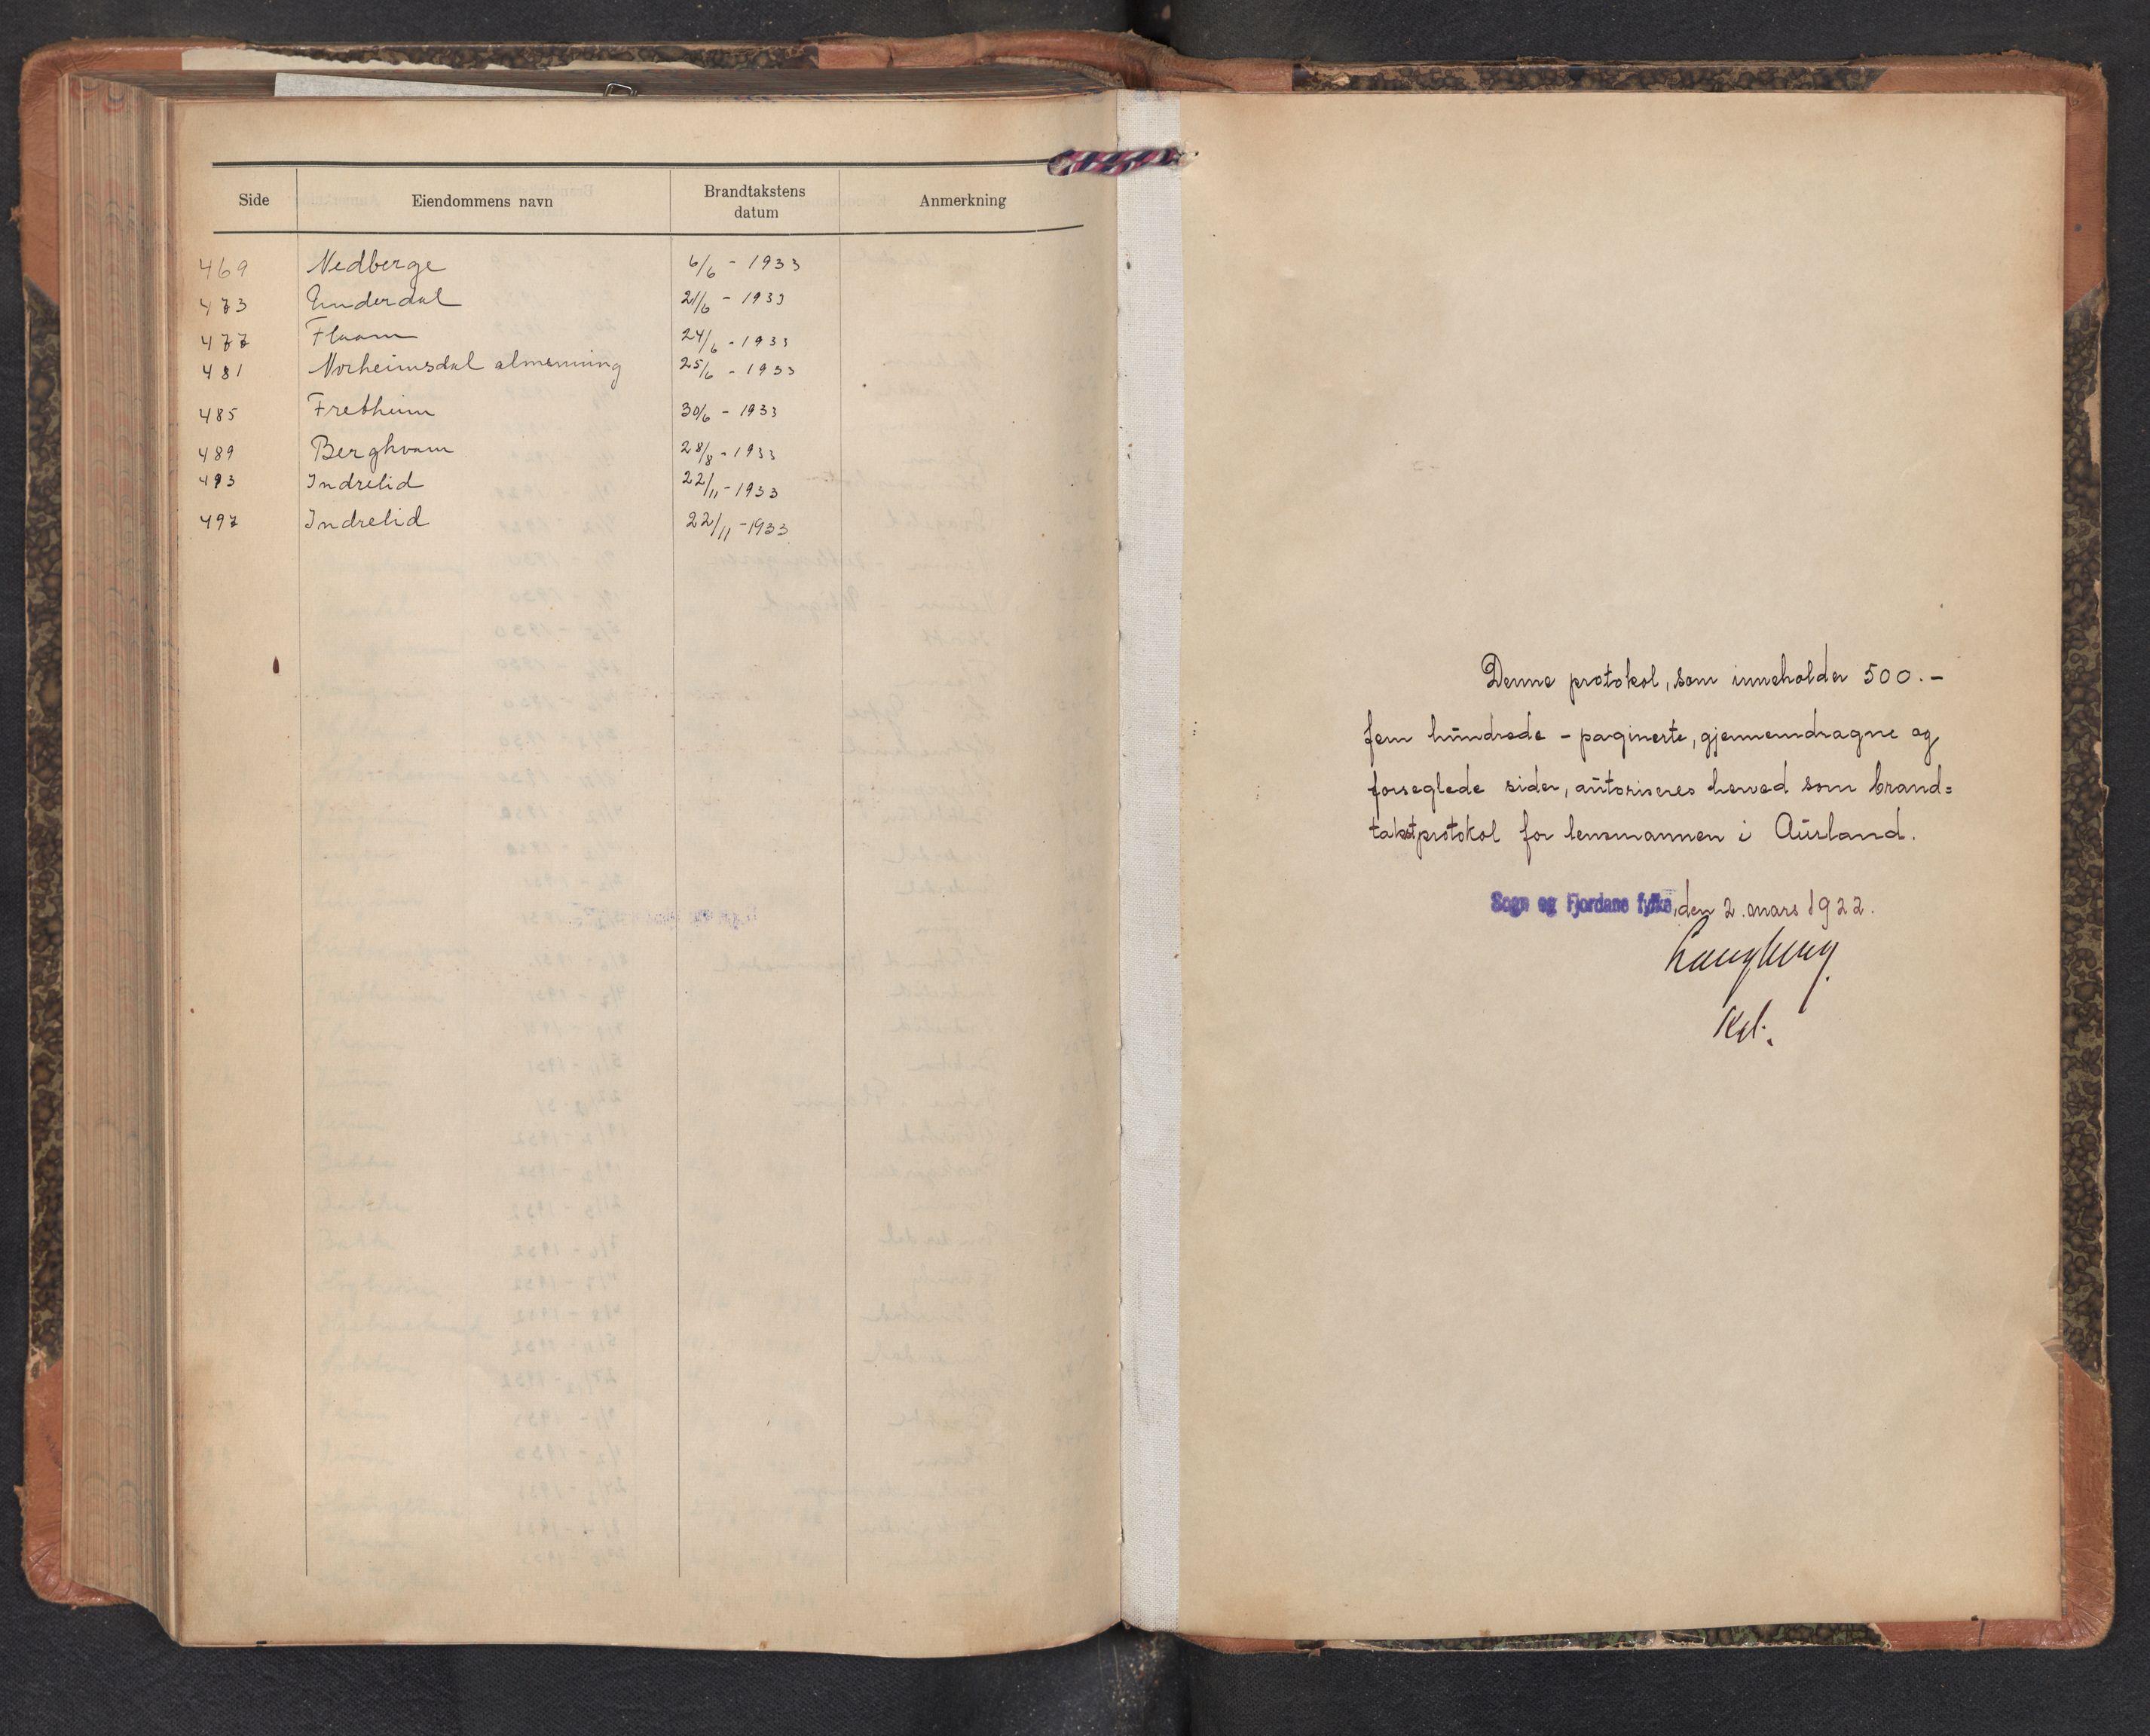 SAB, Lensmannen i Aurland, 0012/L0007: Branntakstprotokoll, skjematakst, 1922-1933